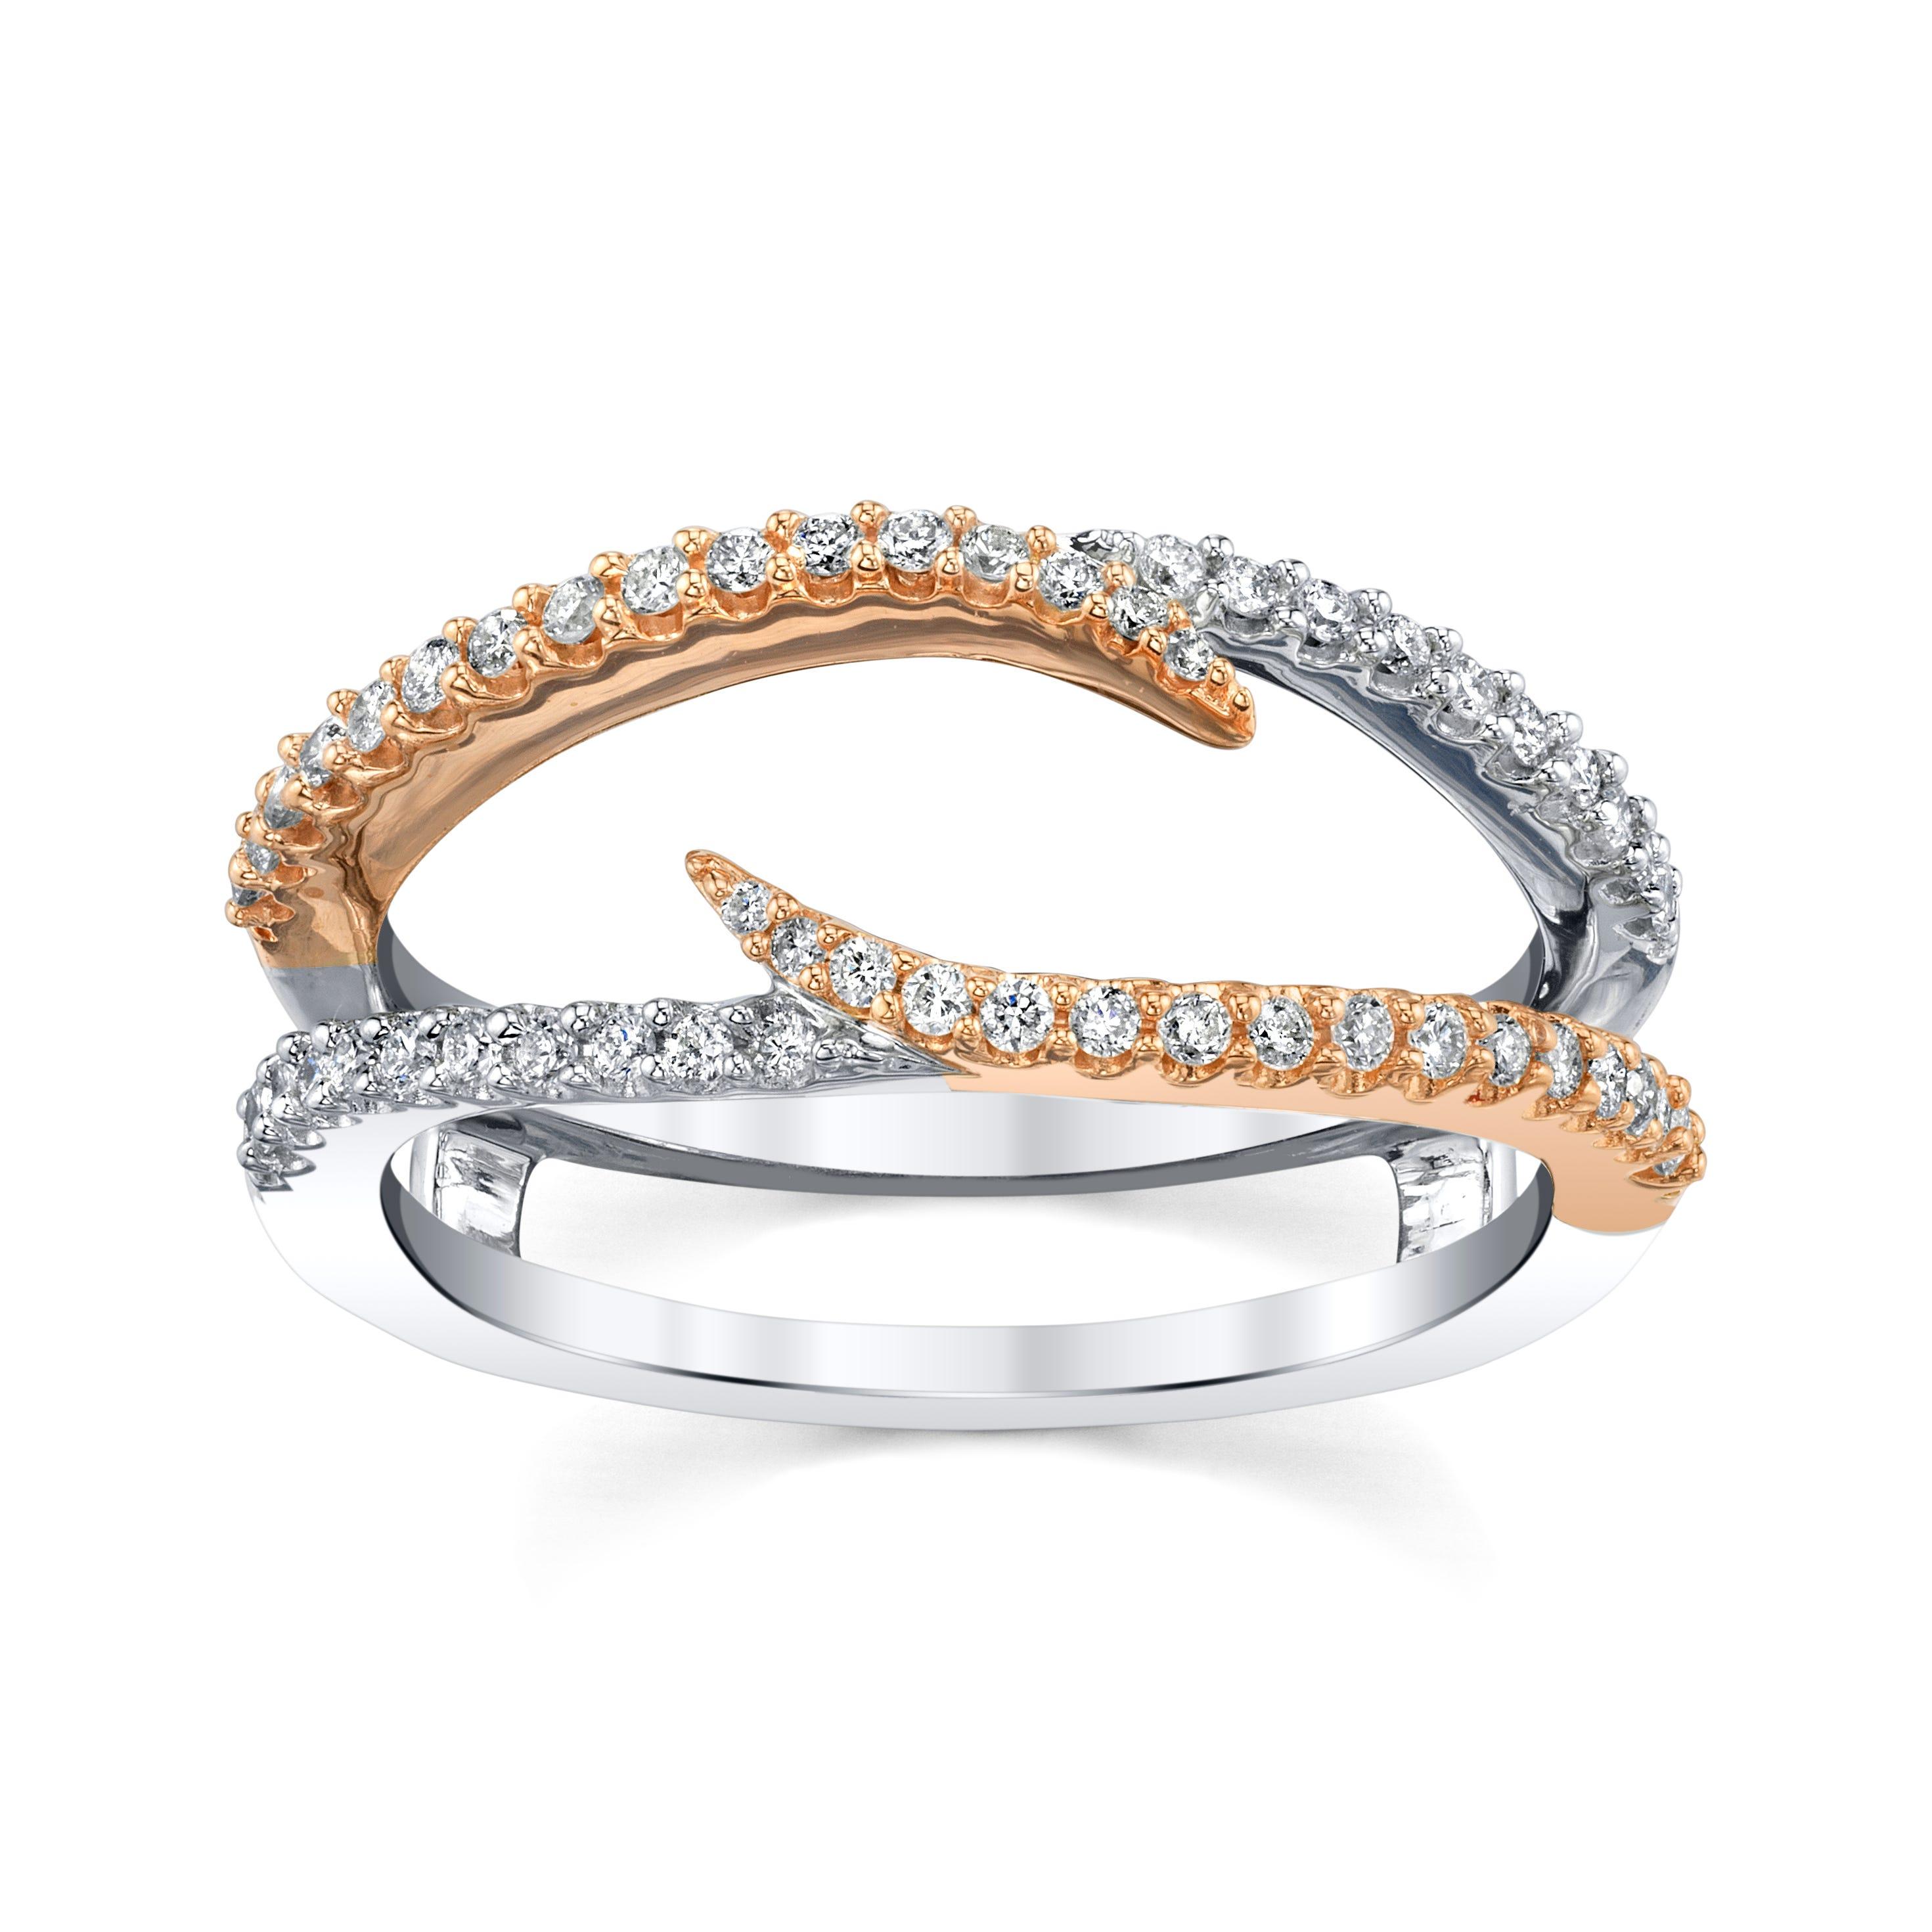 Sirena 1/3ctw. Diamond Freeform Insert in 14k White & Rose Gold